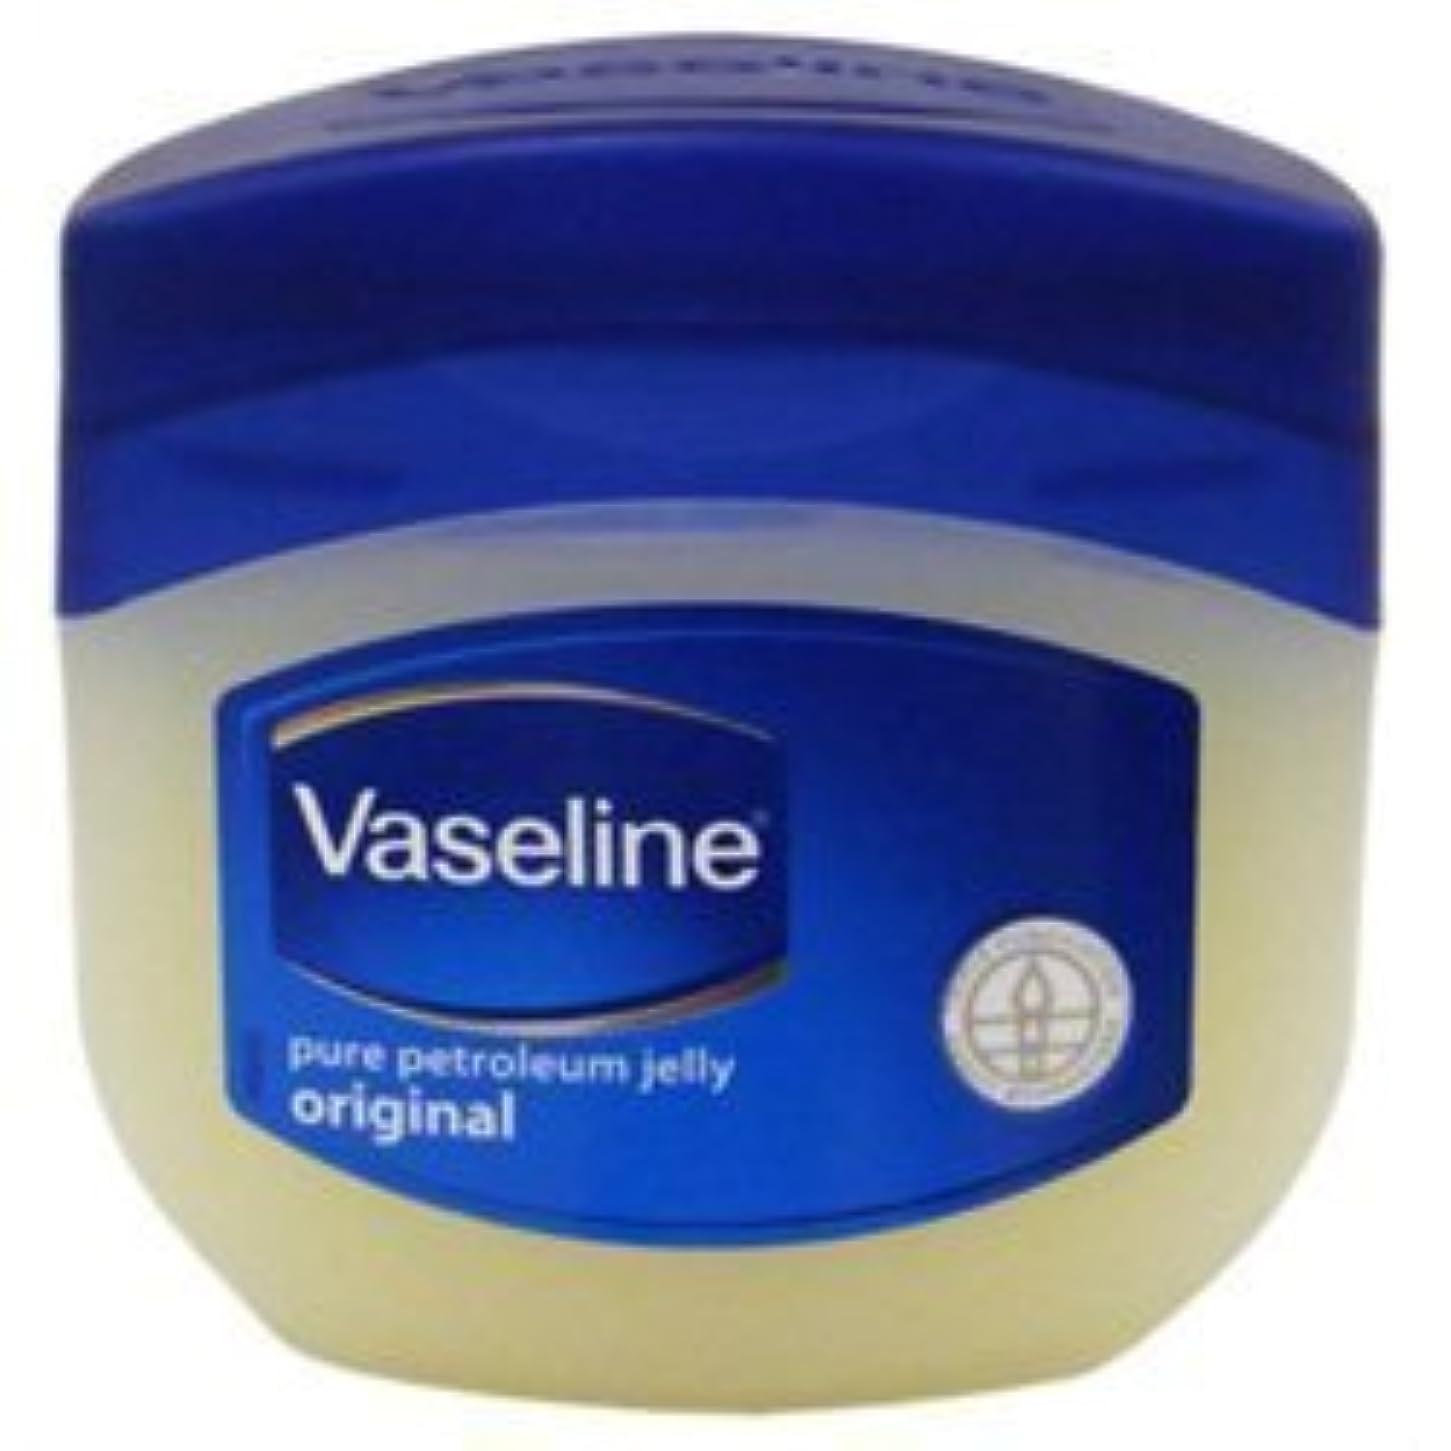 【Vaseline】ヴァセリン ピュアスキンジェリー (スキンオイル) 80g ×5個セット